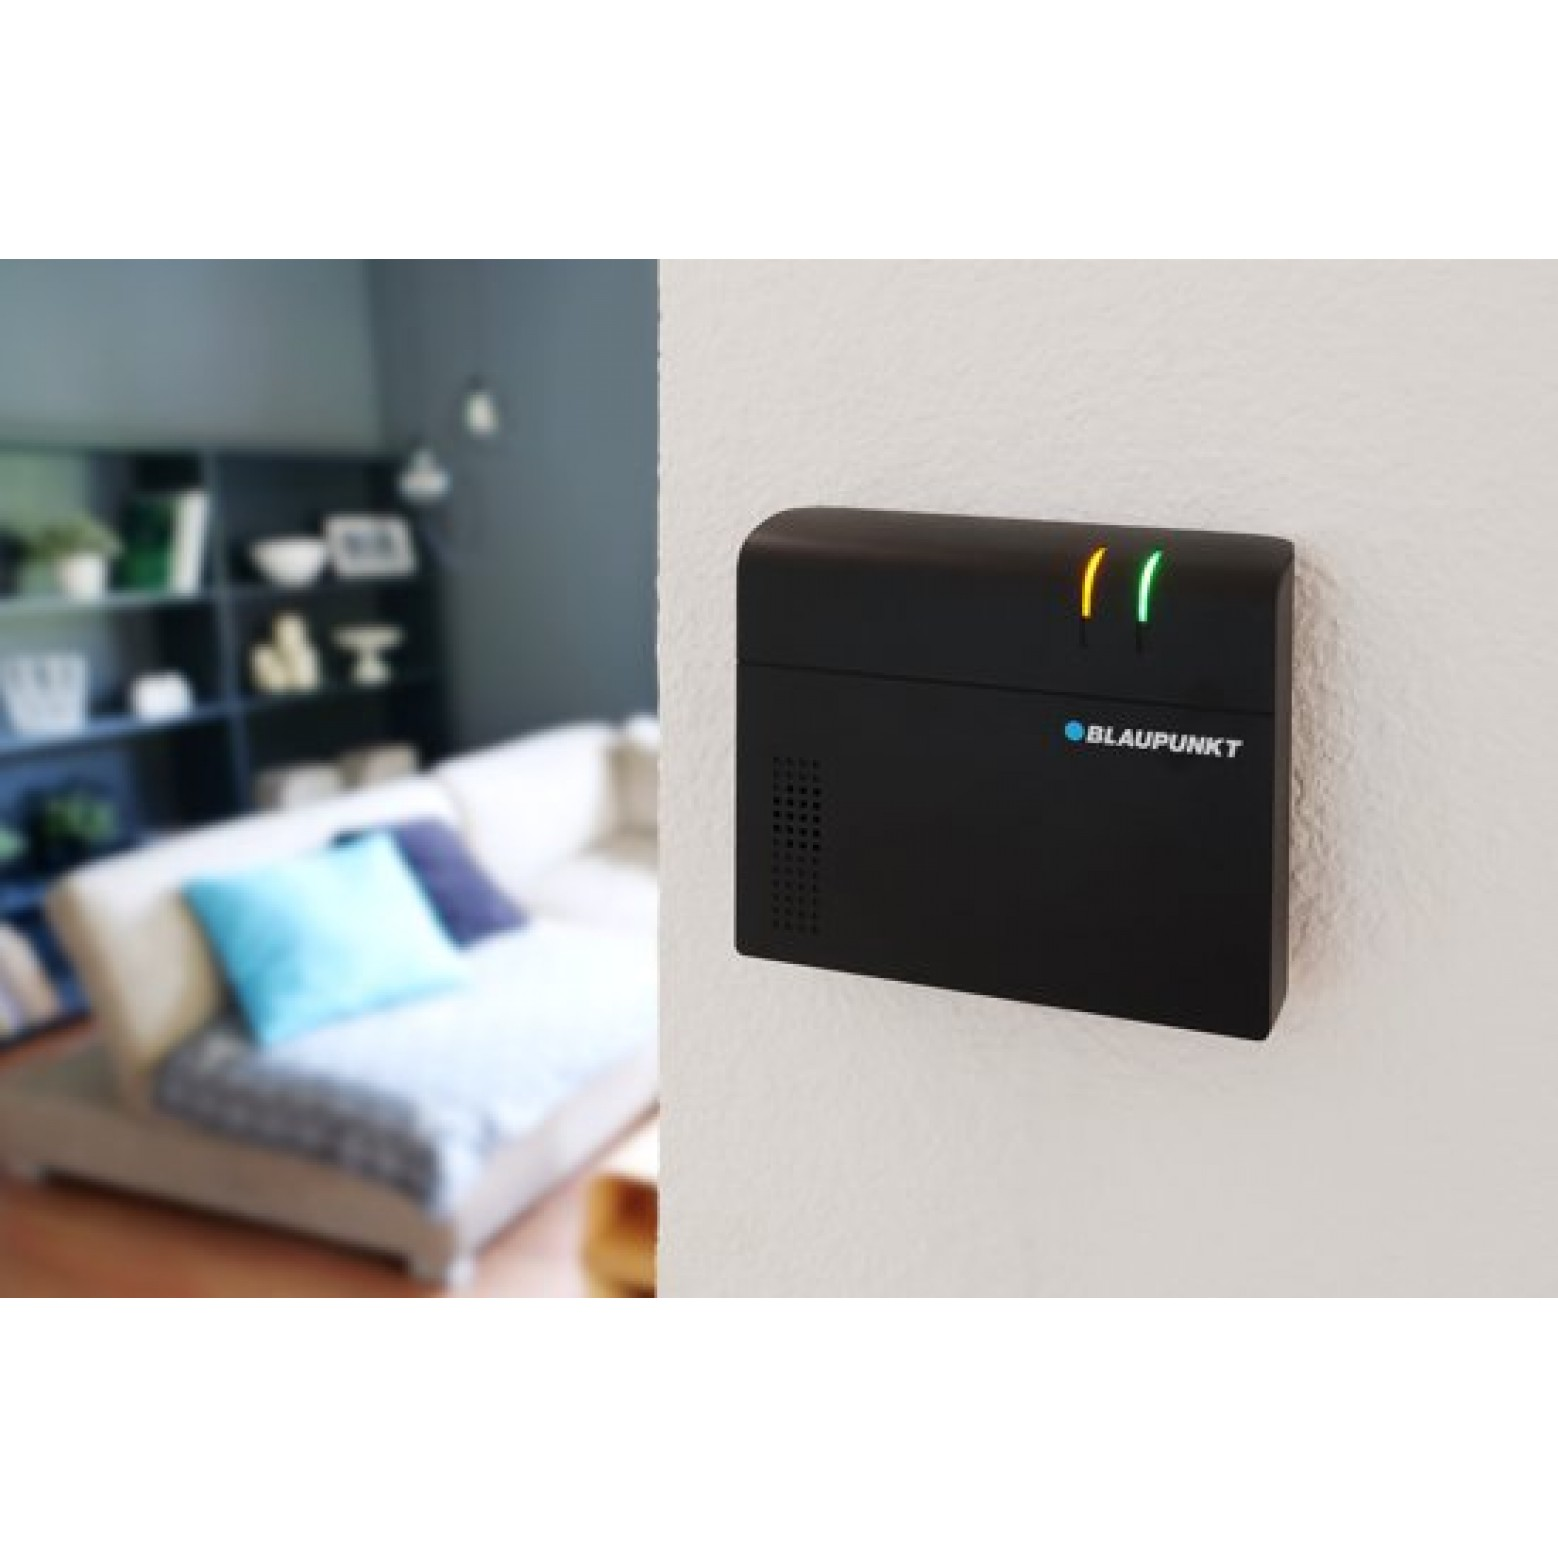 Blaupunkt Q-Pro 6600 Smart Home Draadloos Alarmsysteem